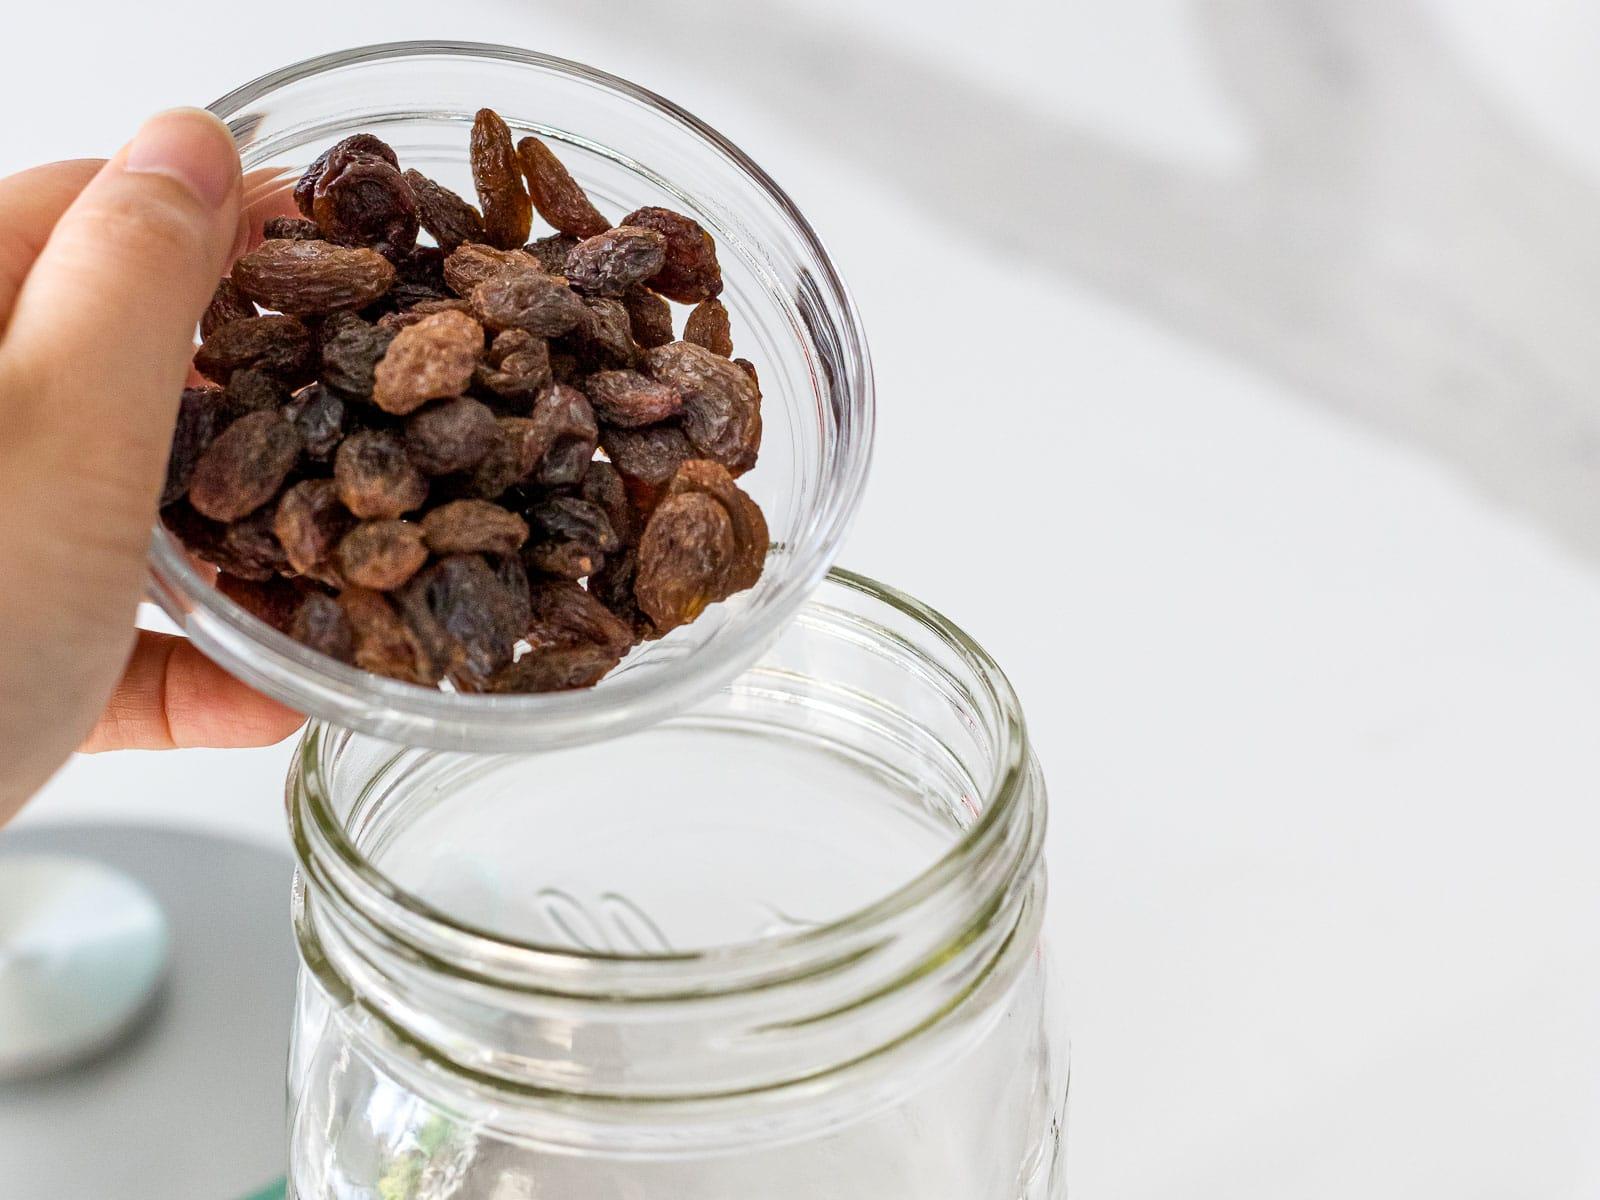 raisins being added to a glass mason jar